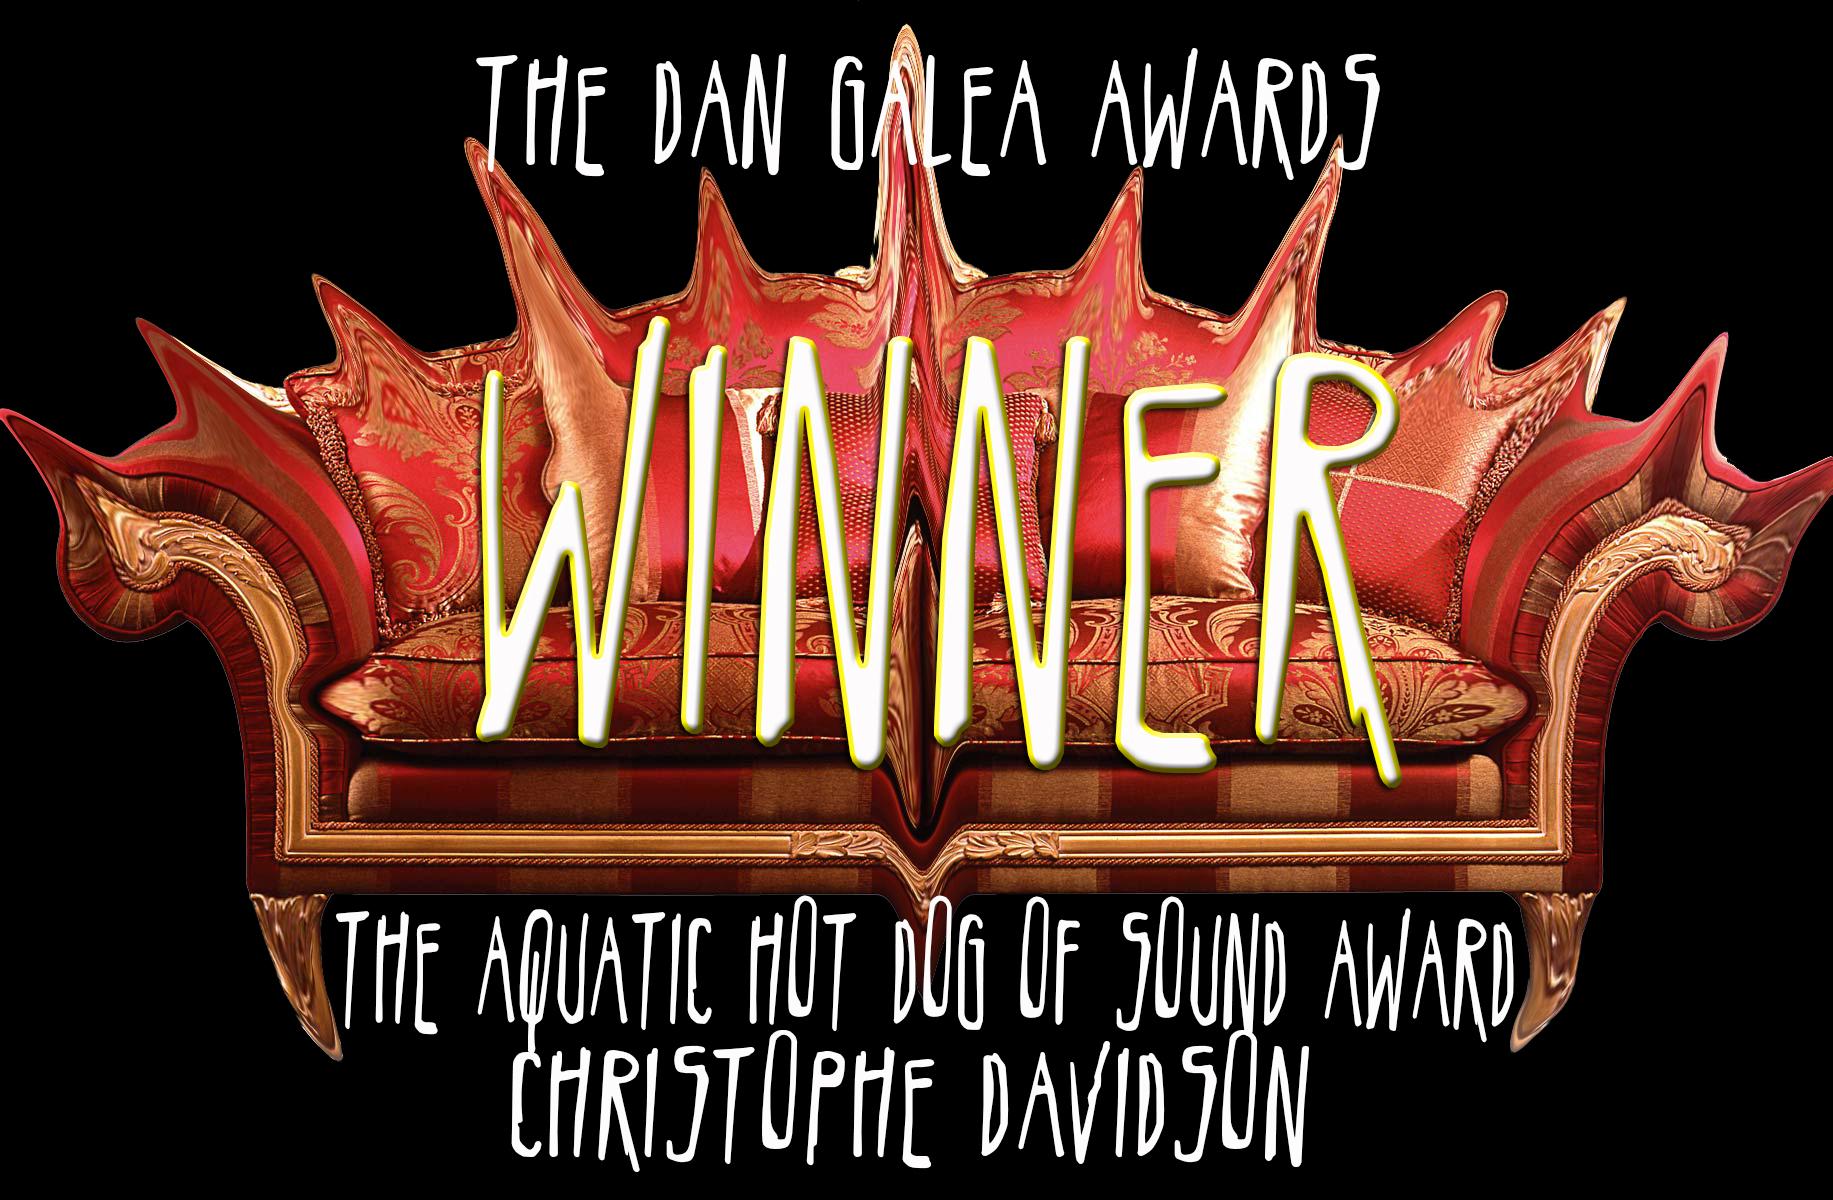 DGawards Christophe Davidson.jpg